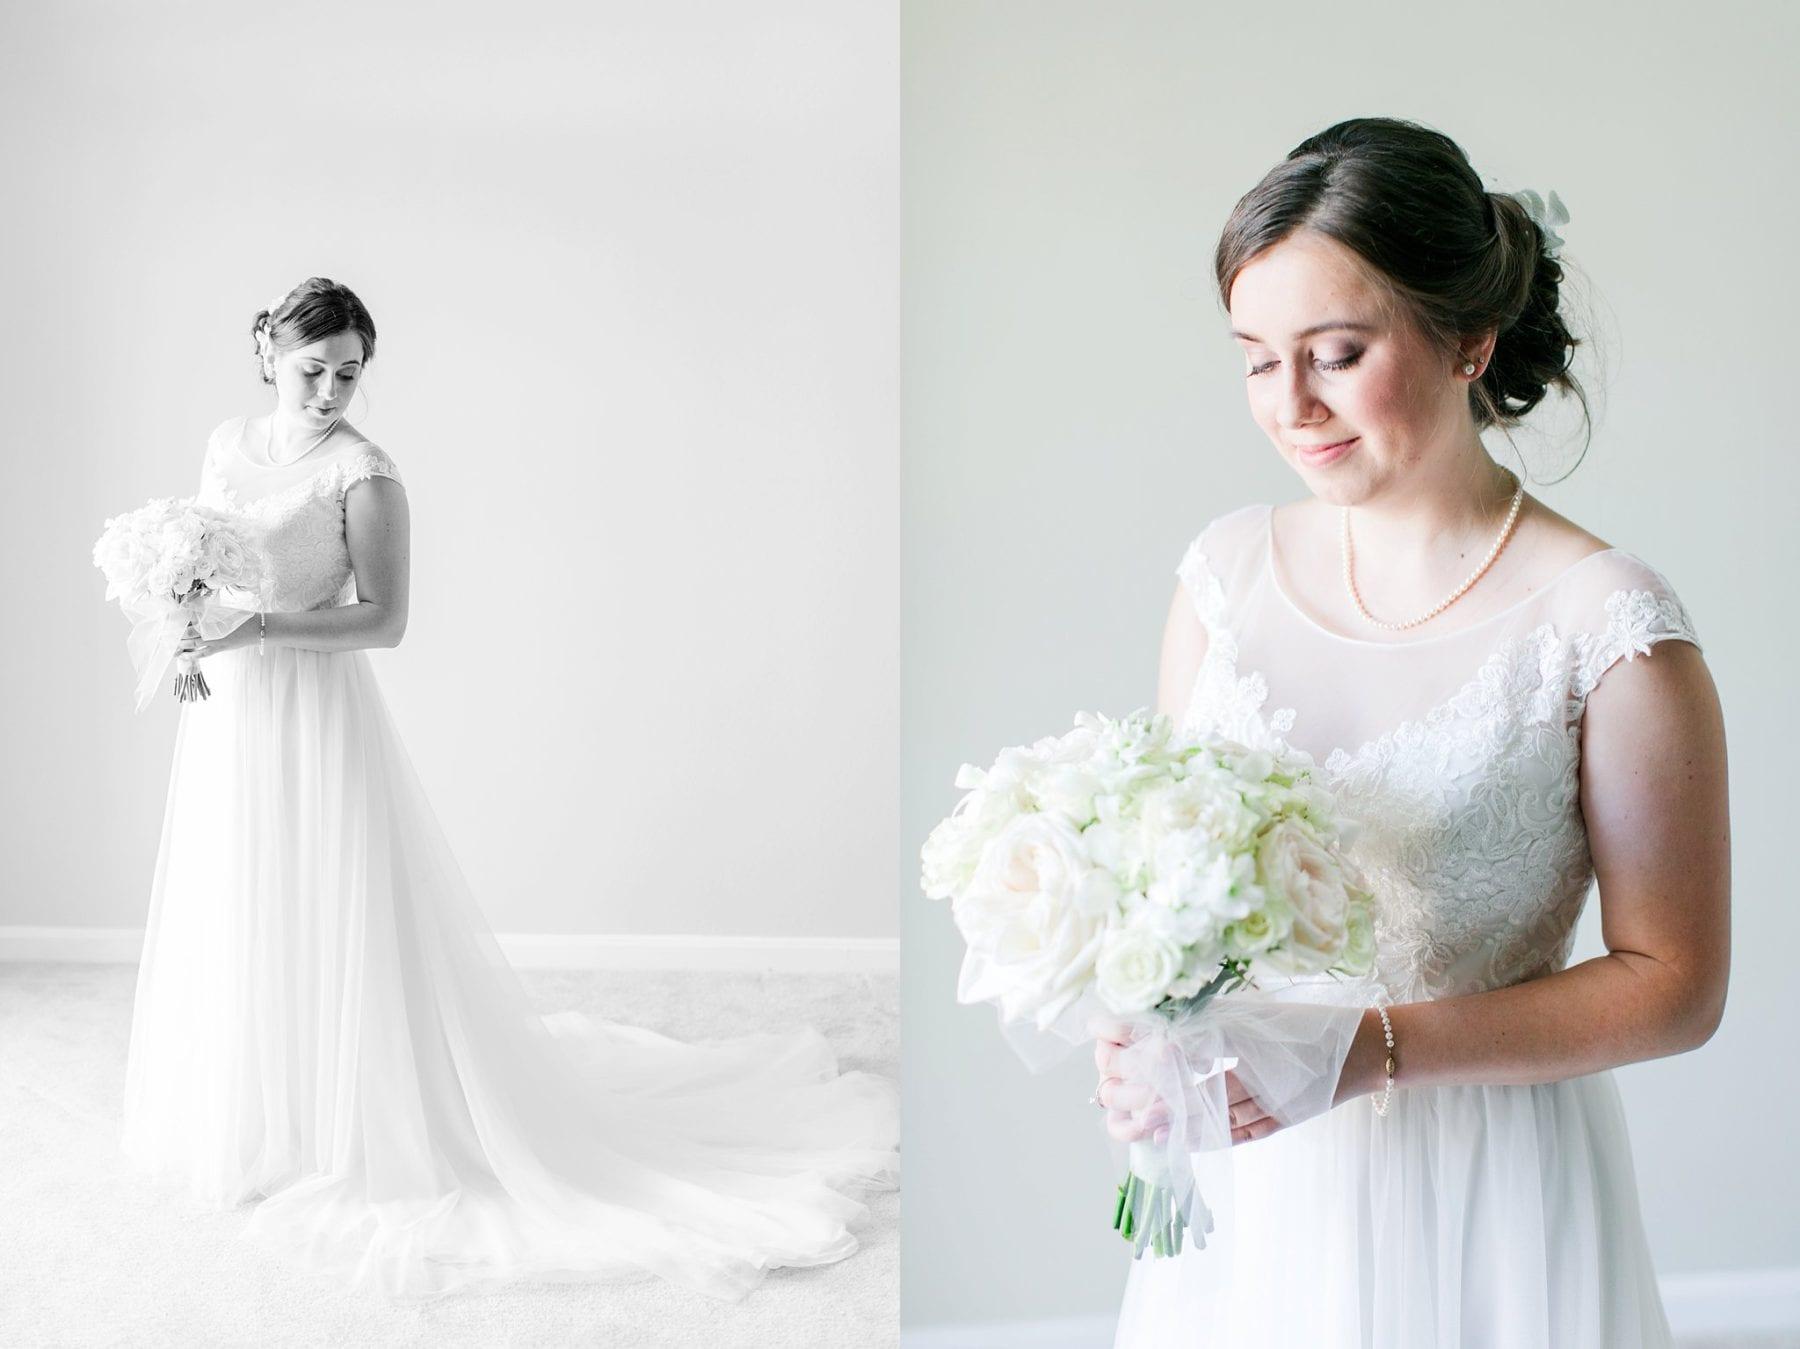 Bristow Manor Wedding Photos Virginia Wedding Photographer Lauren & Andrew Megan Kelsey Photography-94.jpg